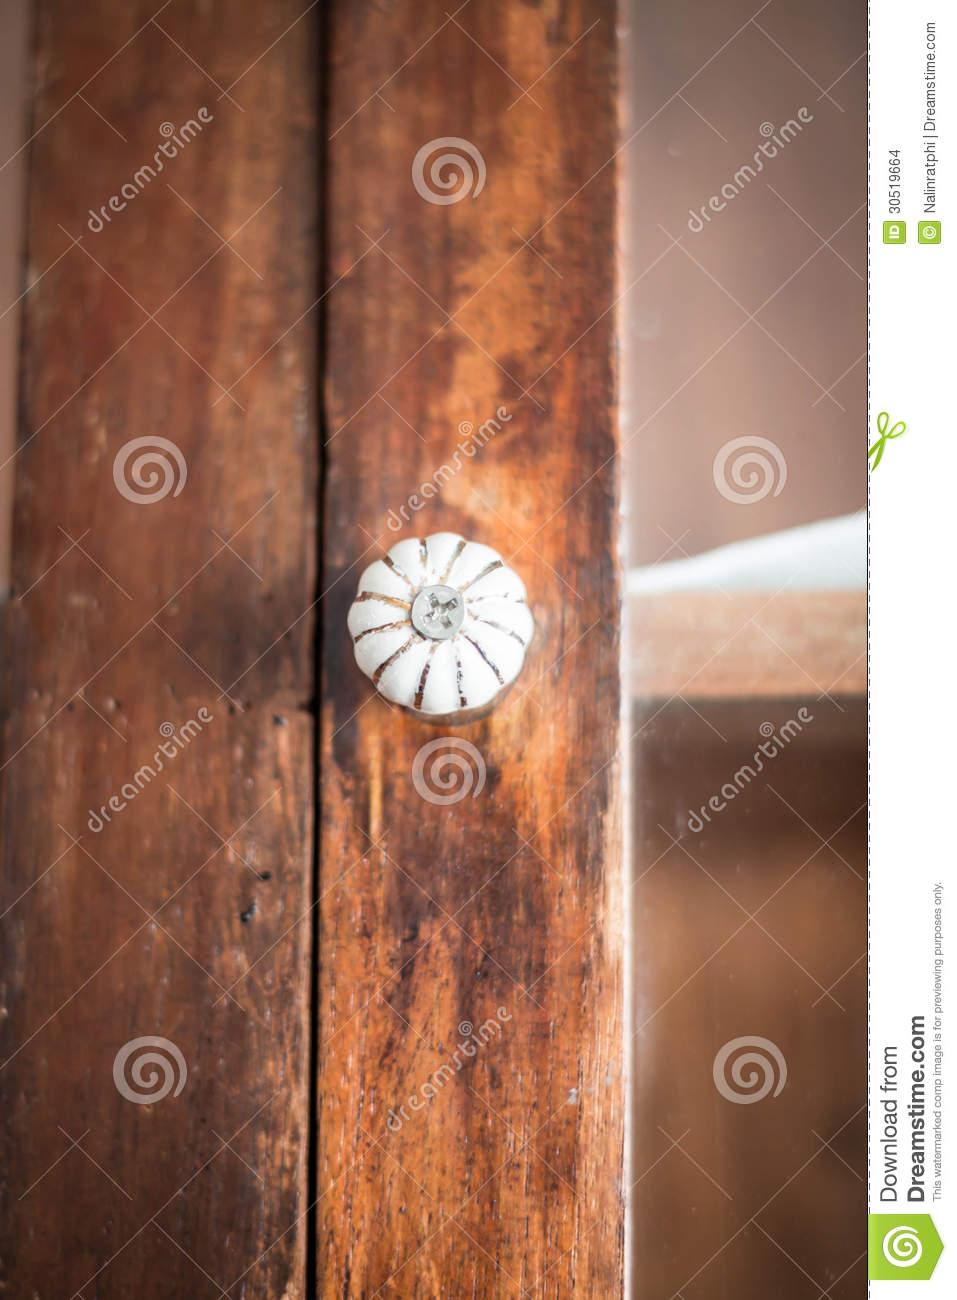 old fashioned door knob photo - 9